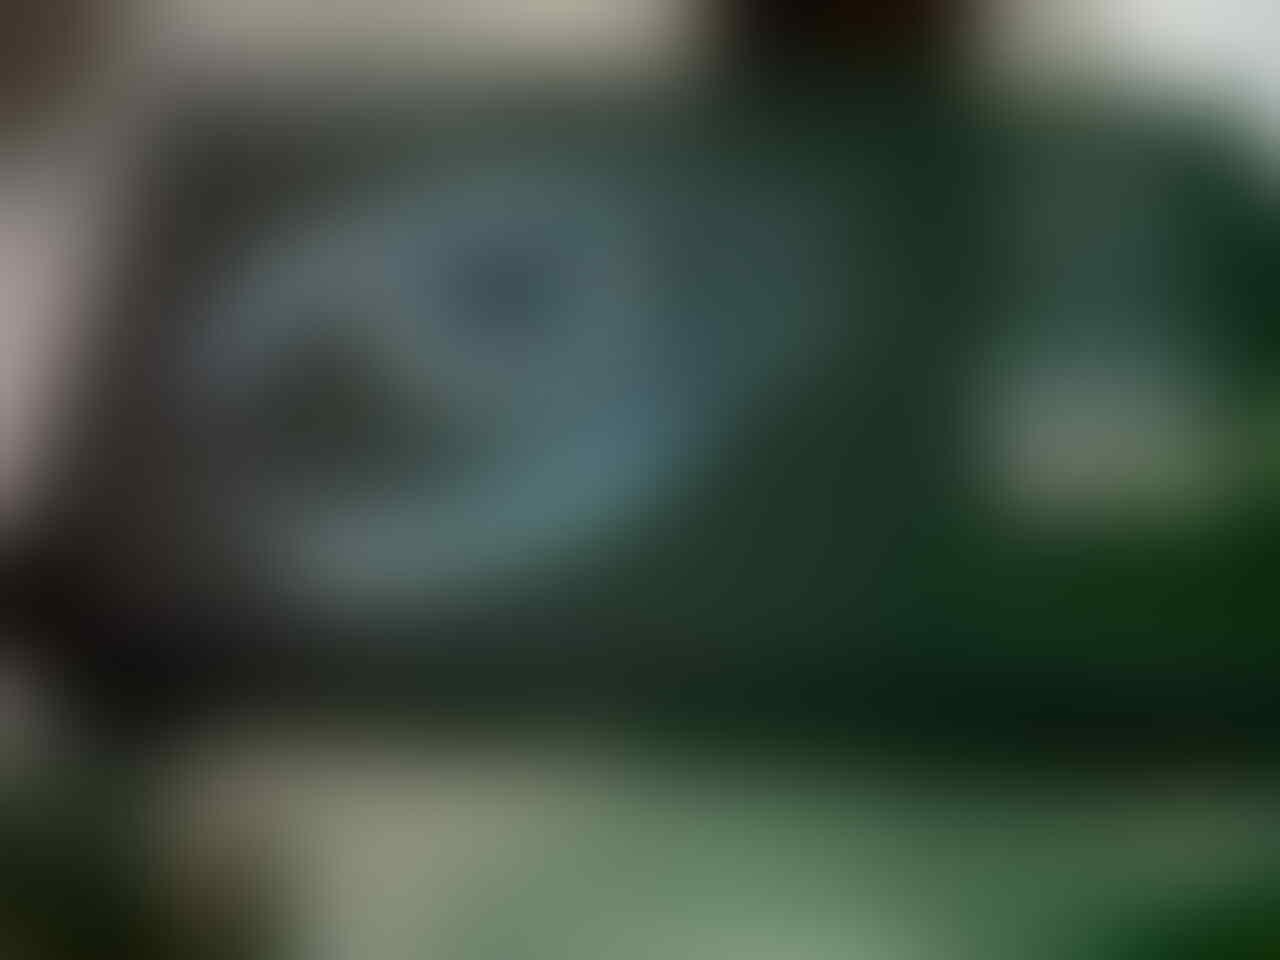 GIGABYTE GTX760 WINFORCE OC (KENCENG BANGET GAN)